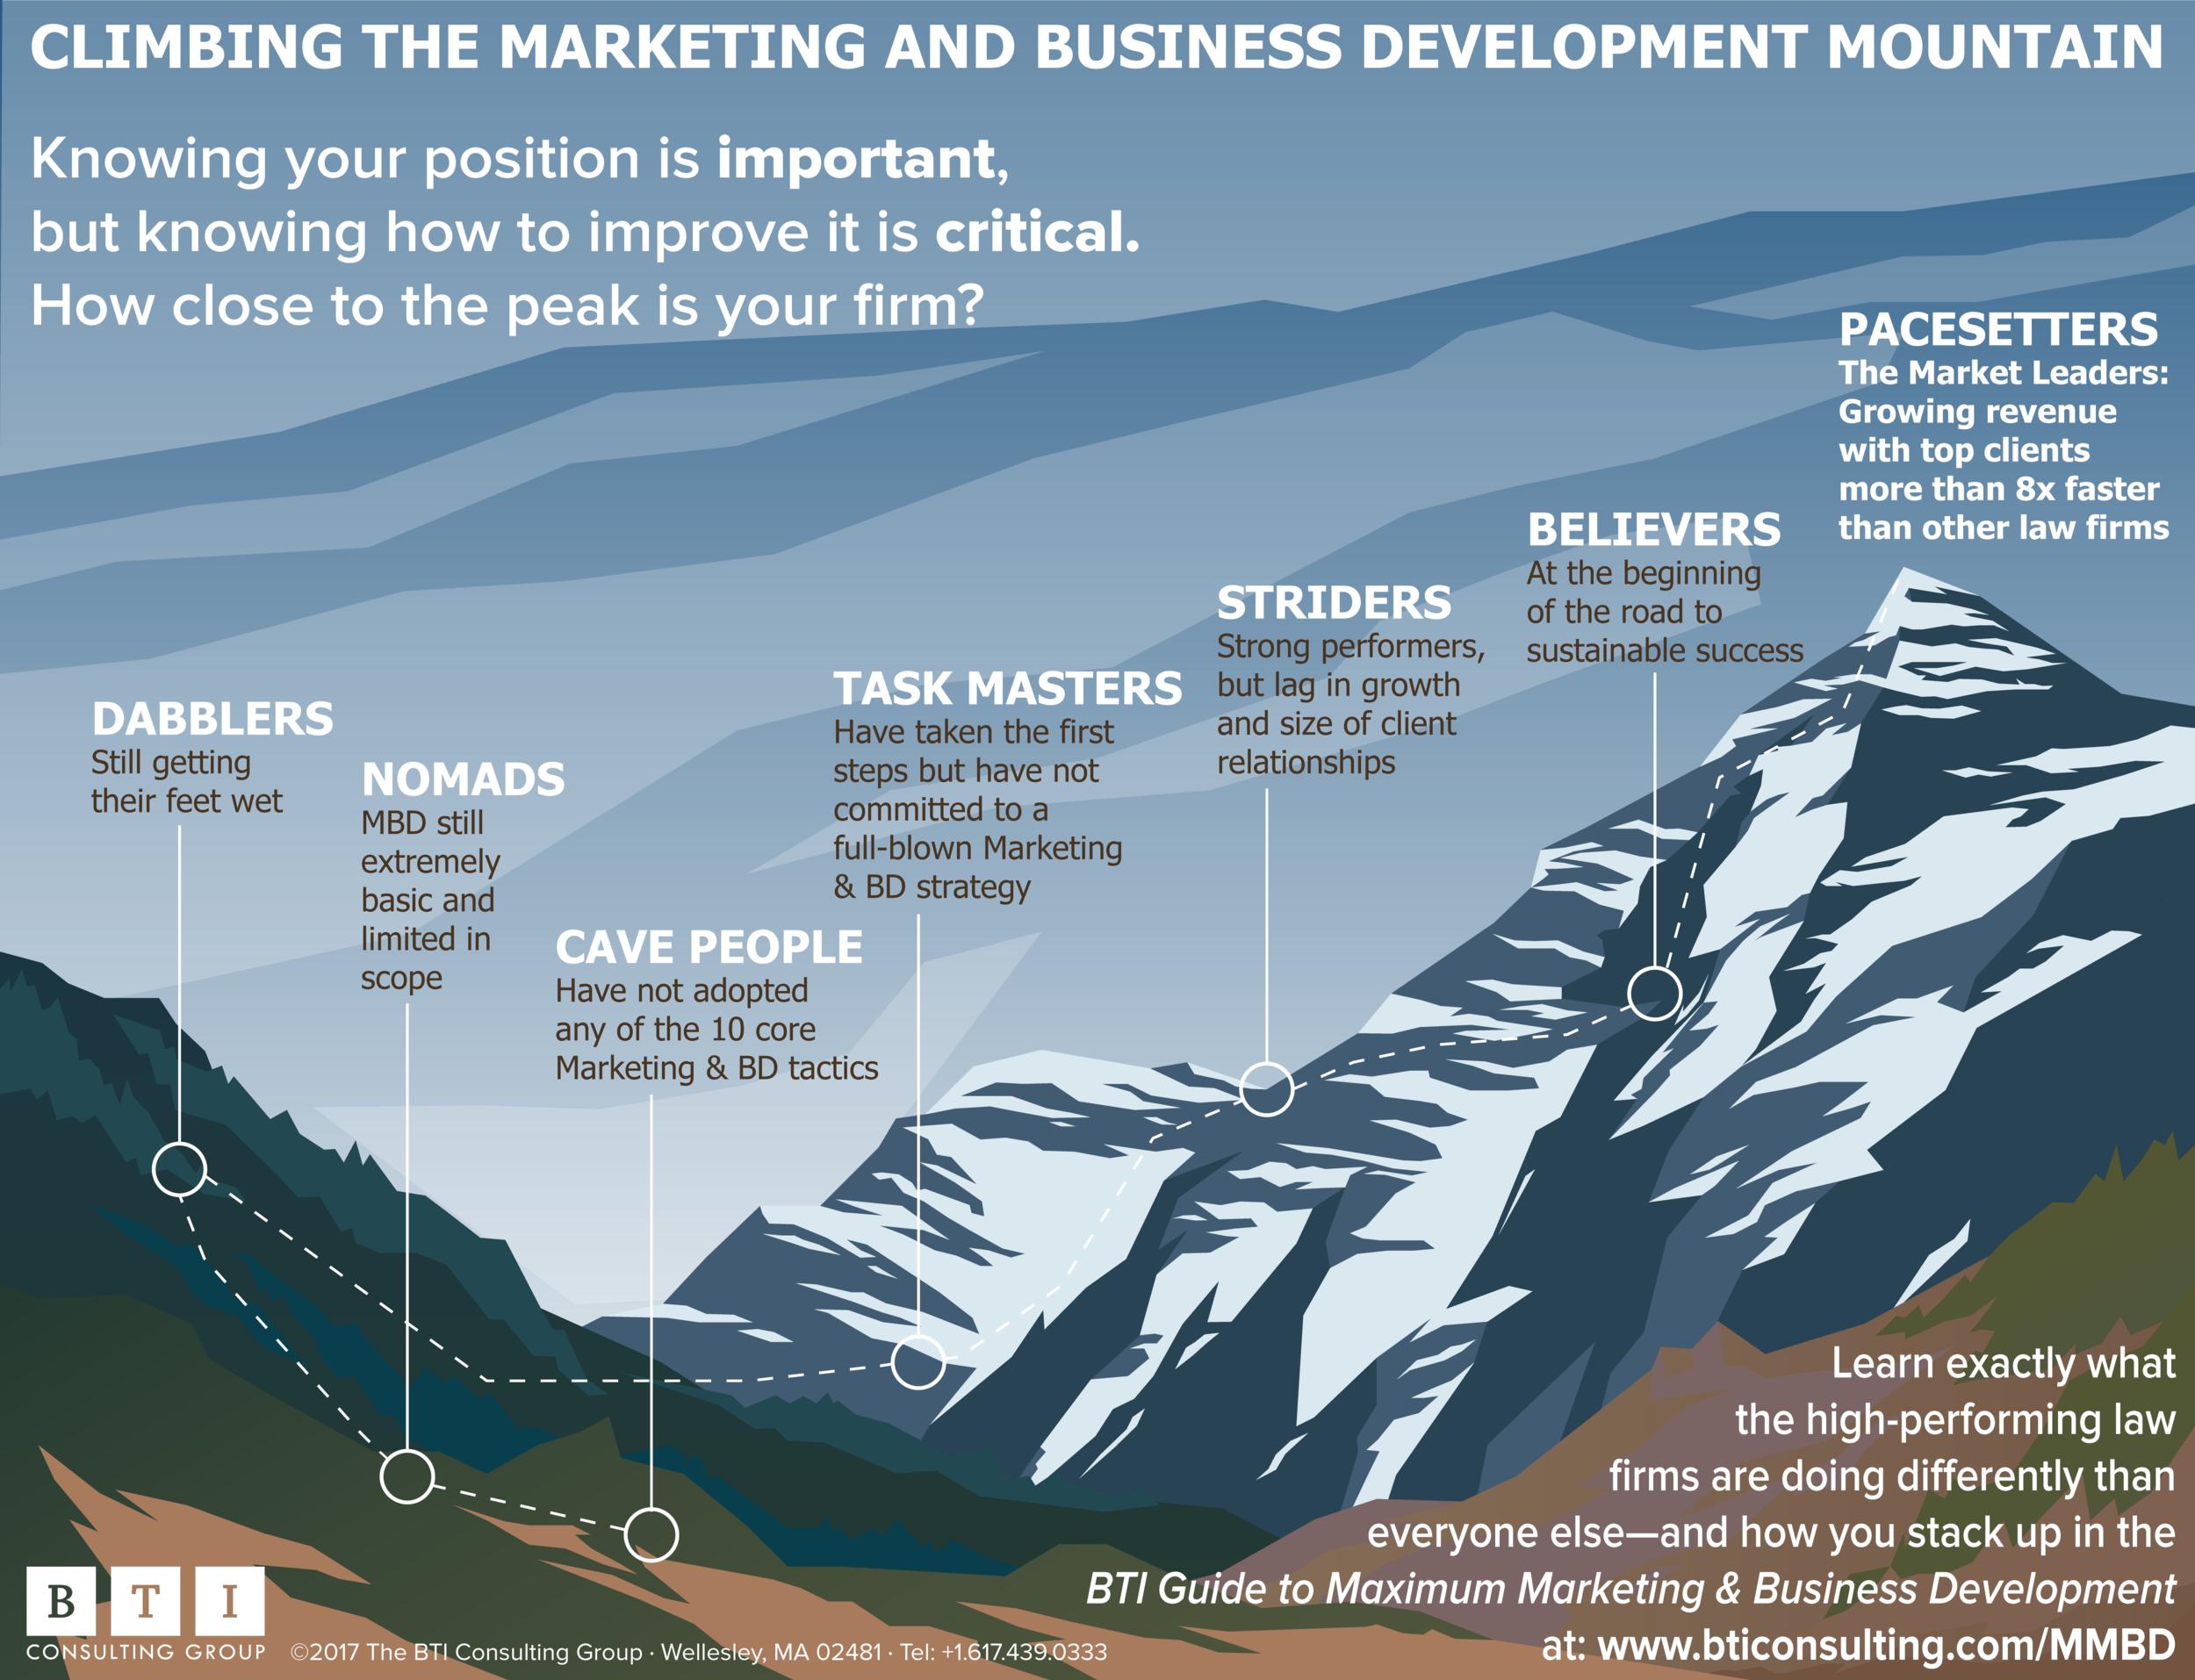 BTI-Marketing-Business-Development-Performance